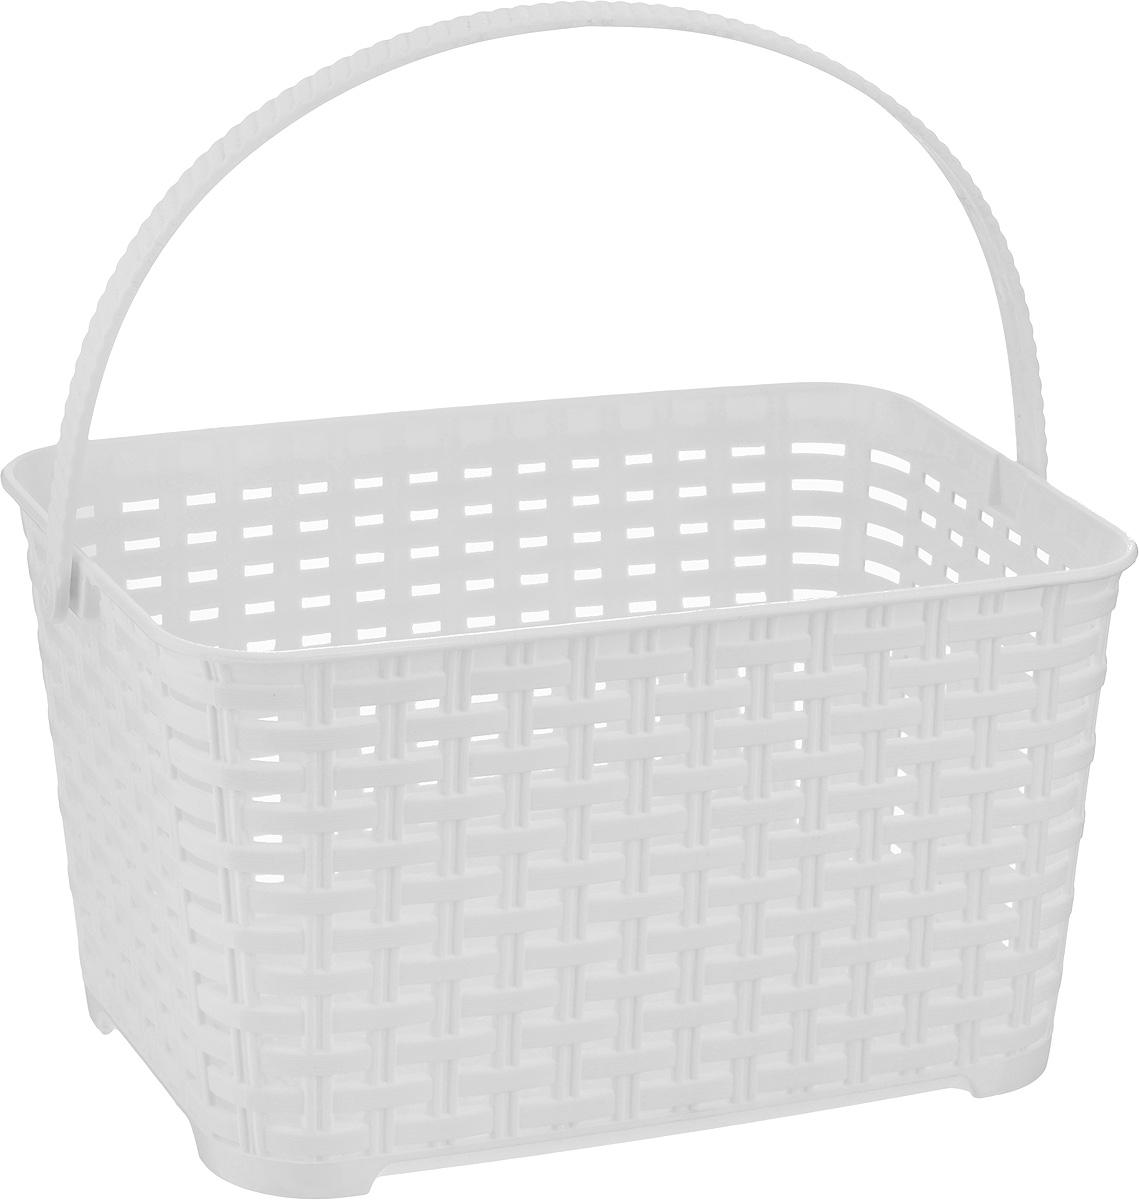 Корзина Альтернатива Плетенка, с ручкой, цвет: белый, 3 л ершик для туалета альтернатива плетенка белый